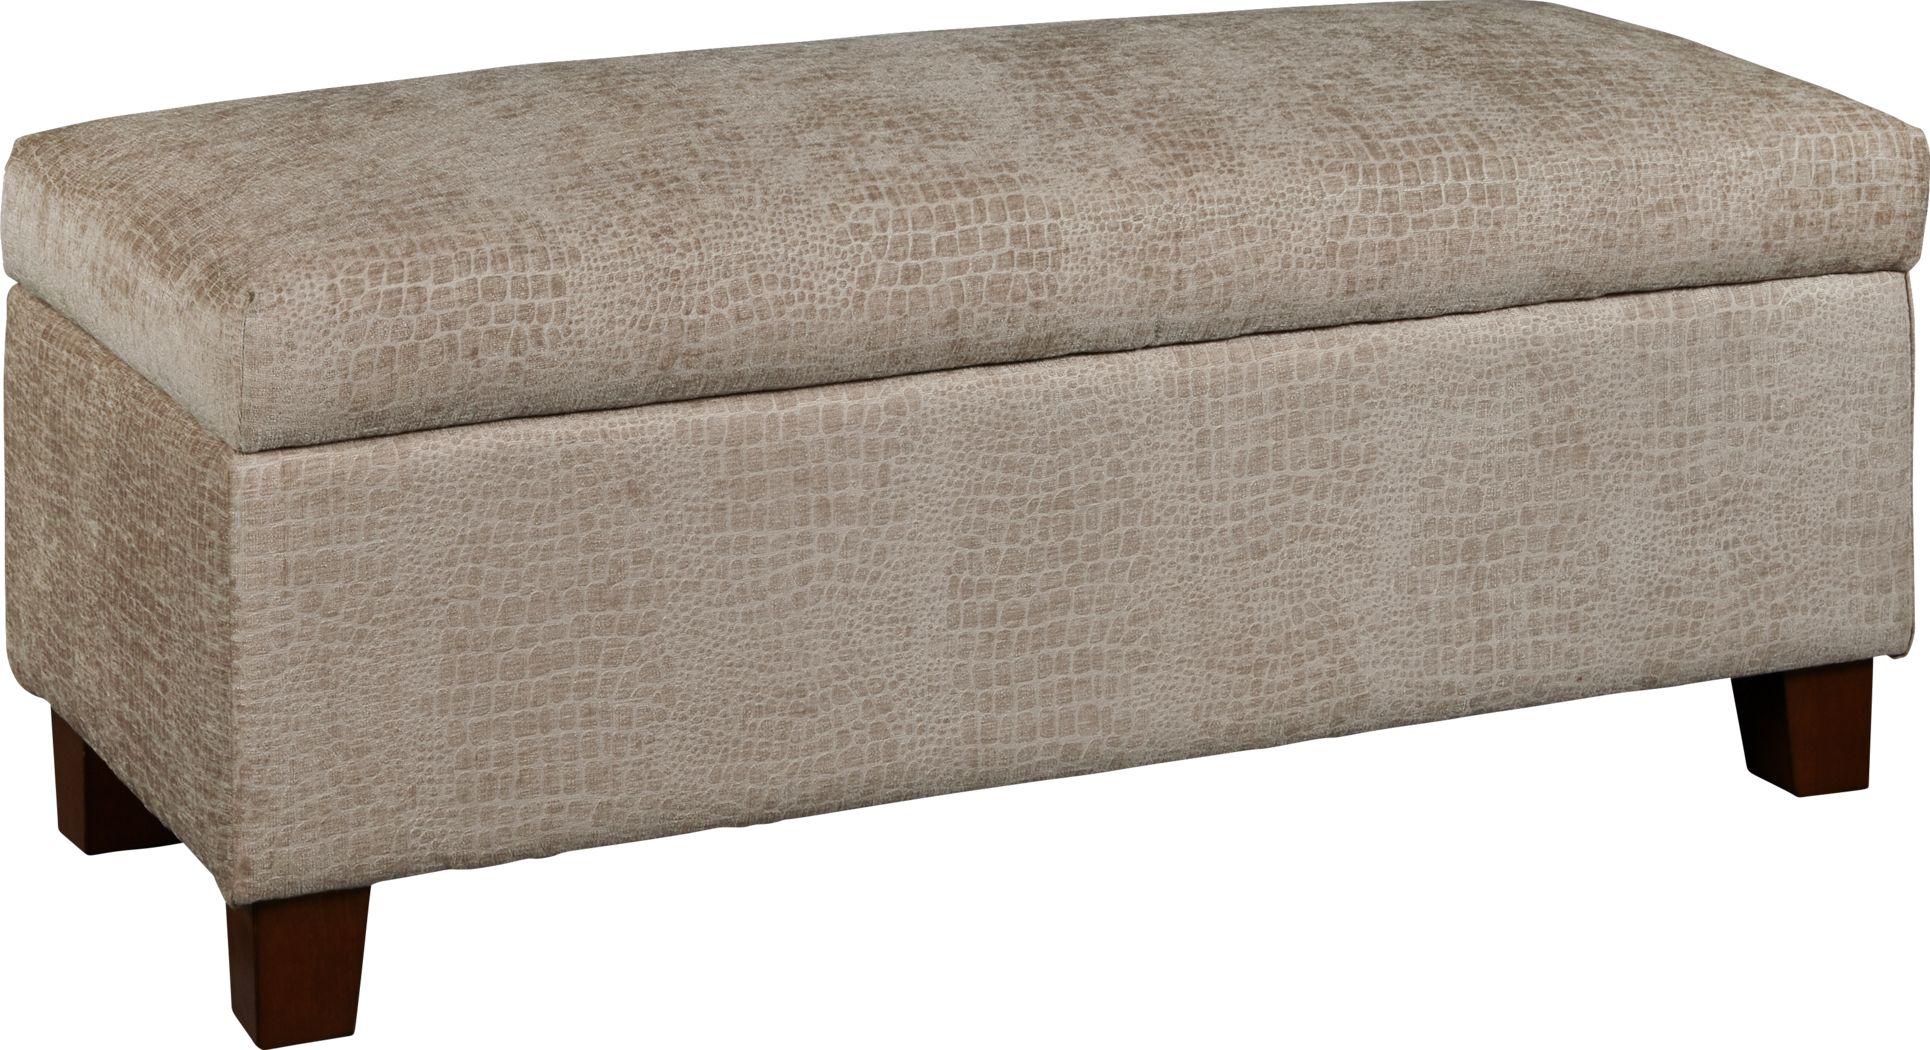 Thoburn Taupe Bench